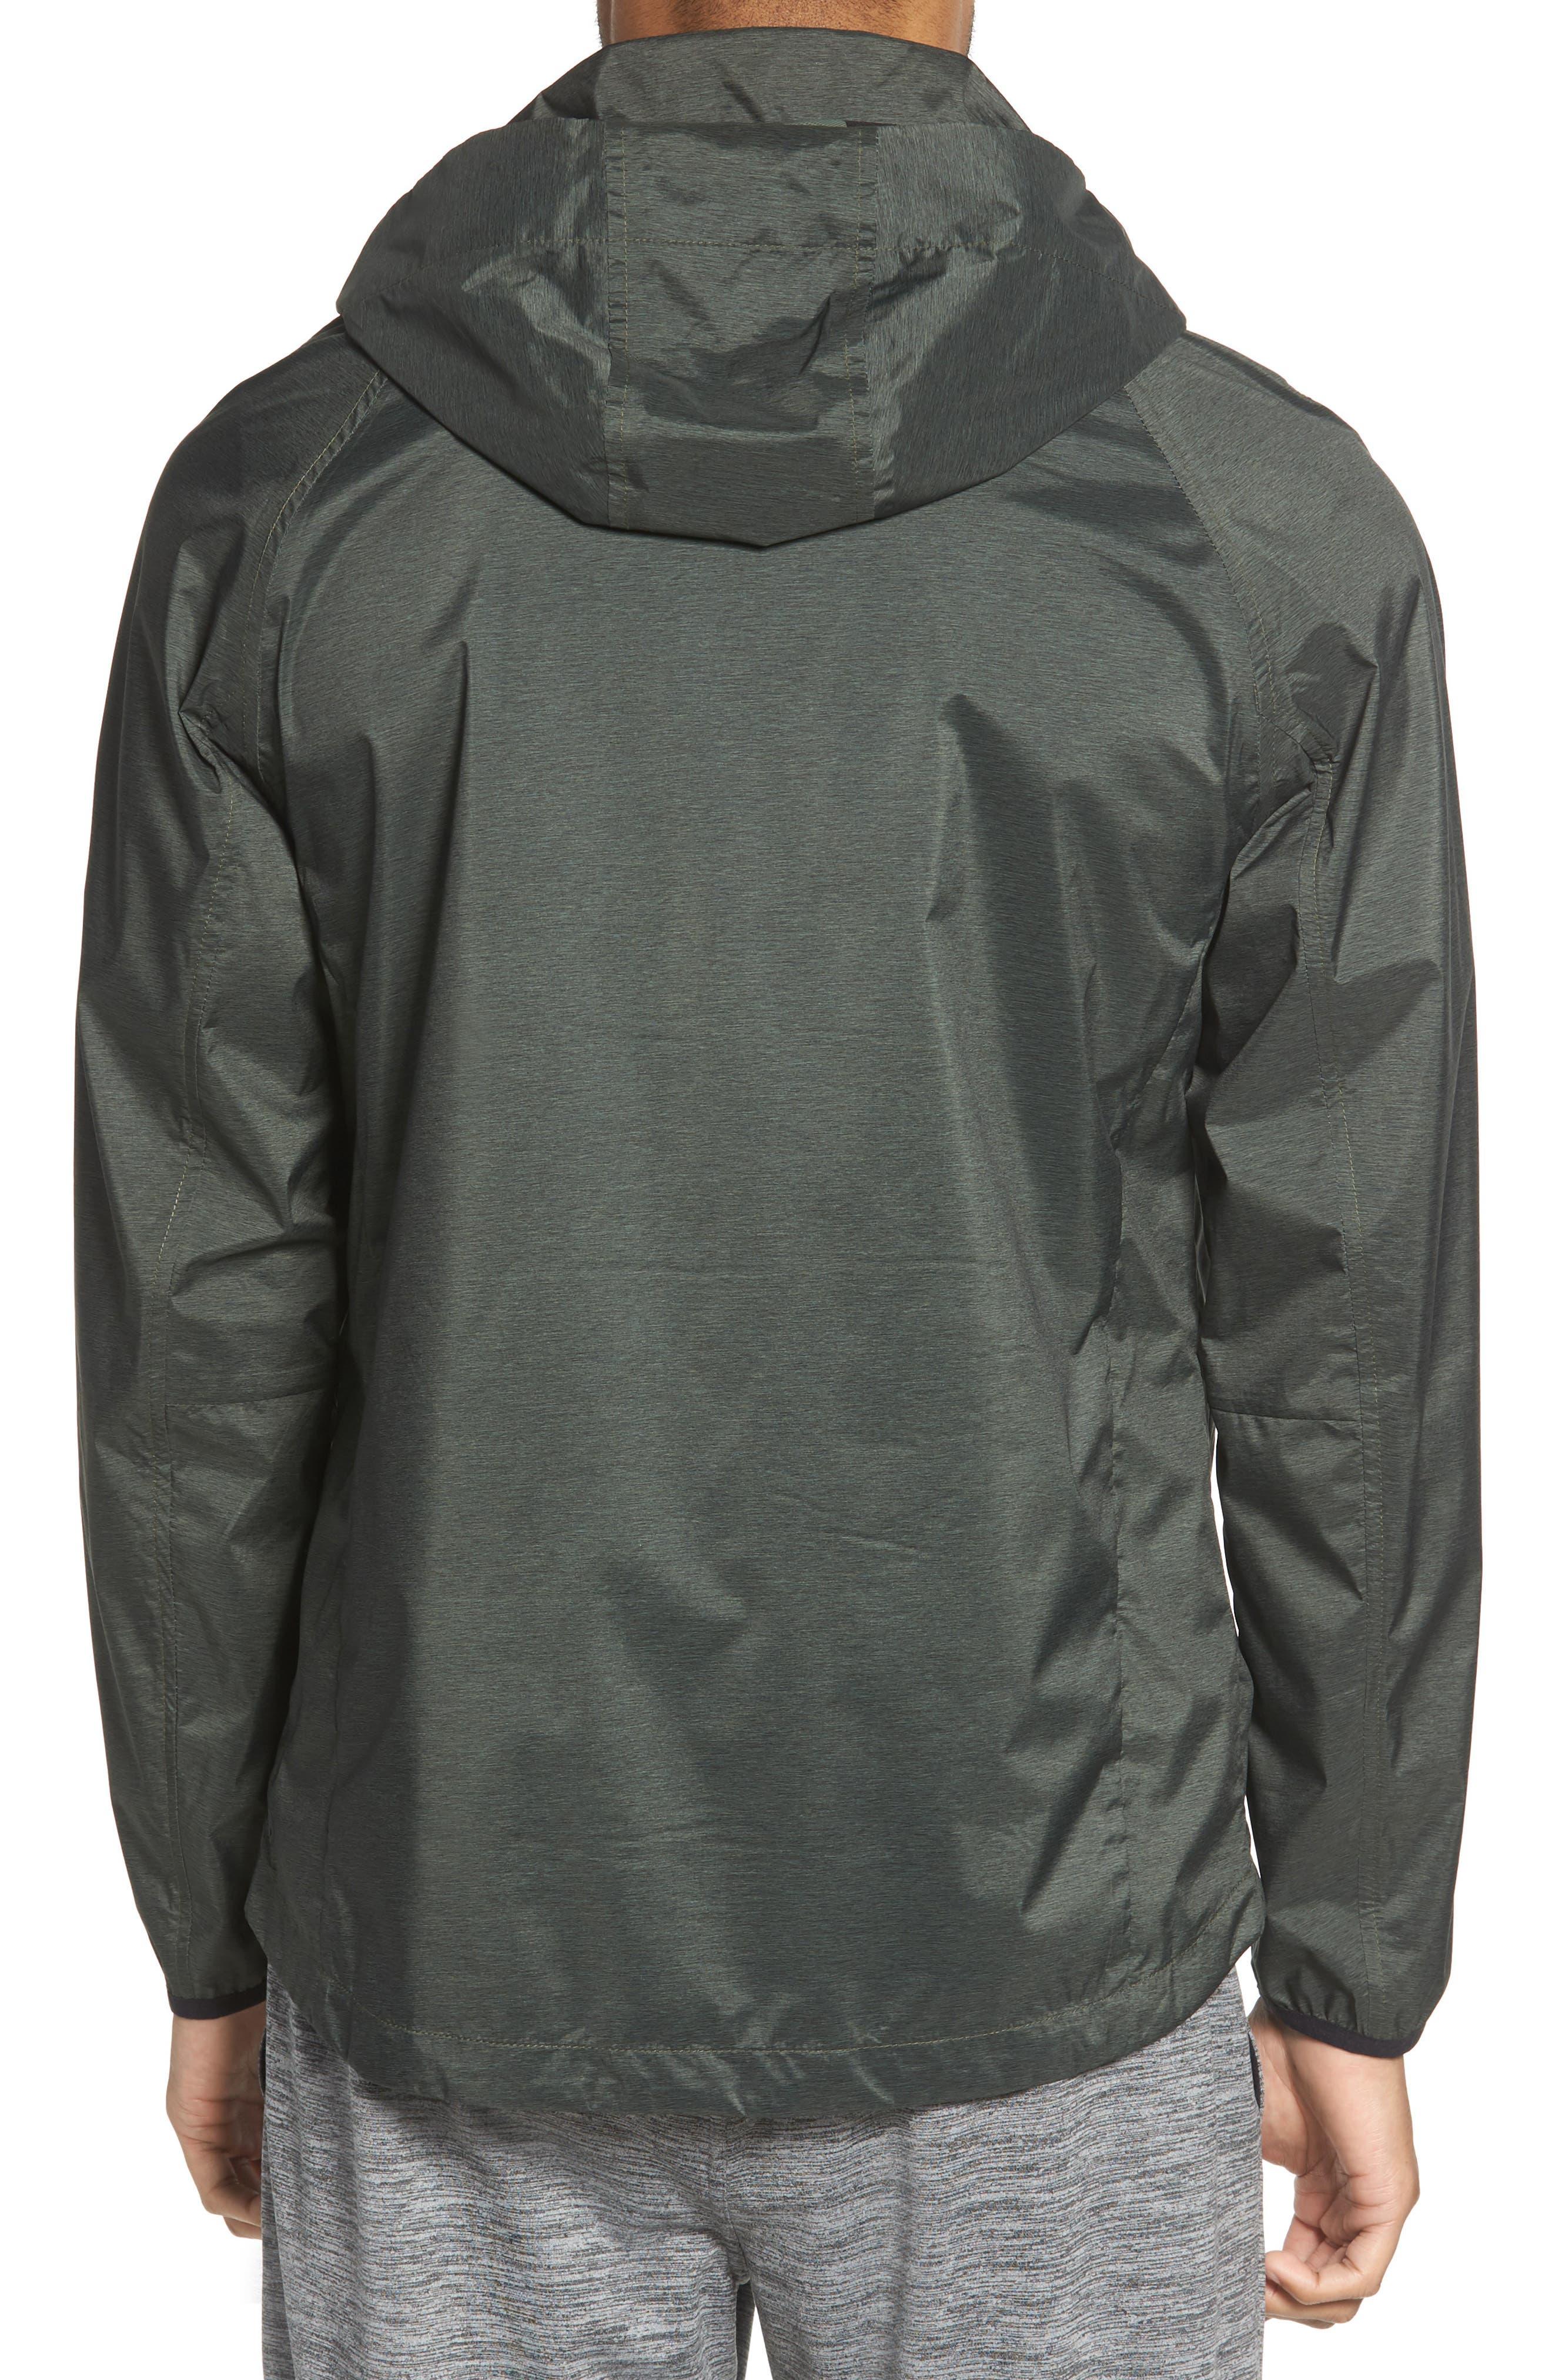 Xieite Hooded Jacket,                             Alternate thumbnail 2, color,                             GREEN TACTICAL MELANGE